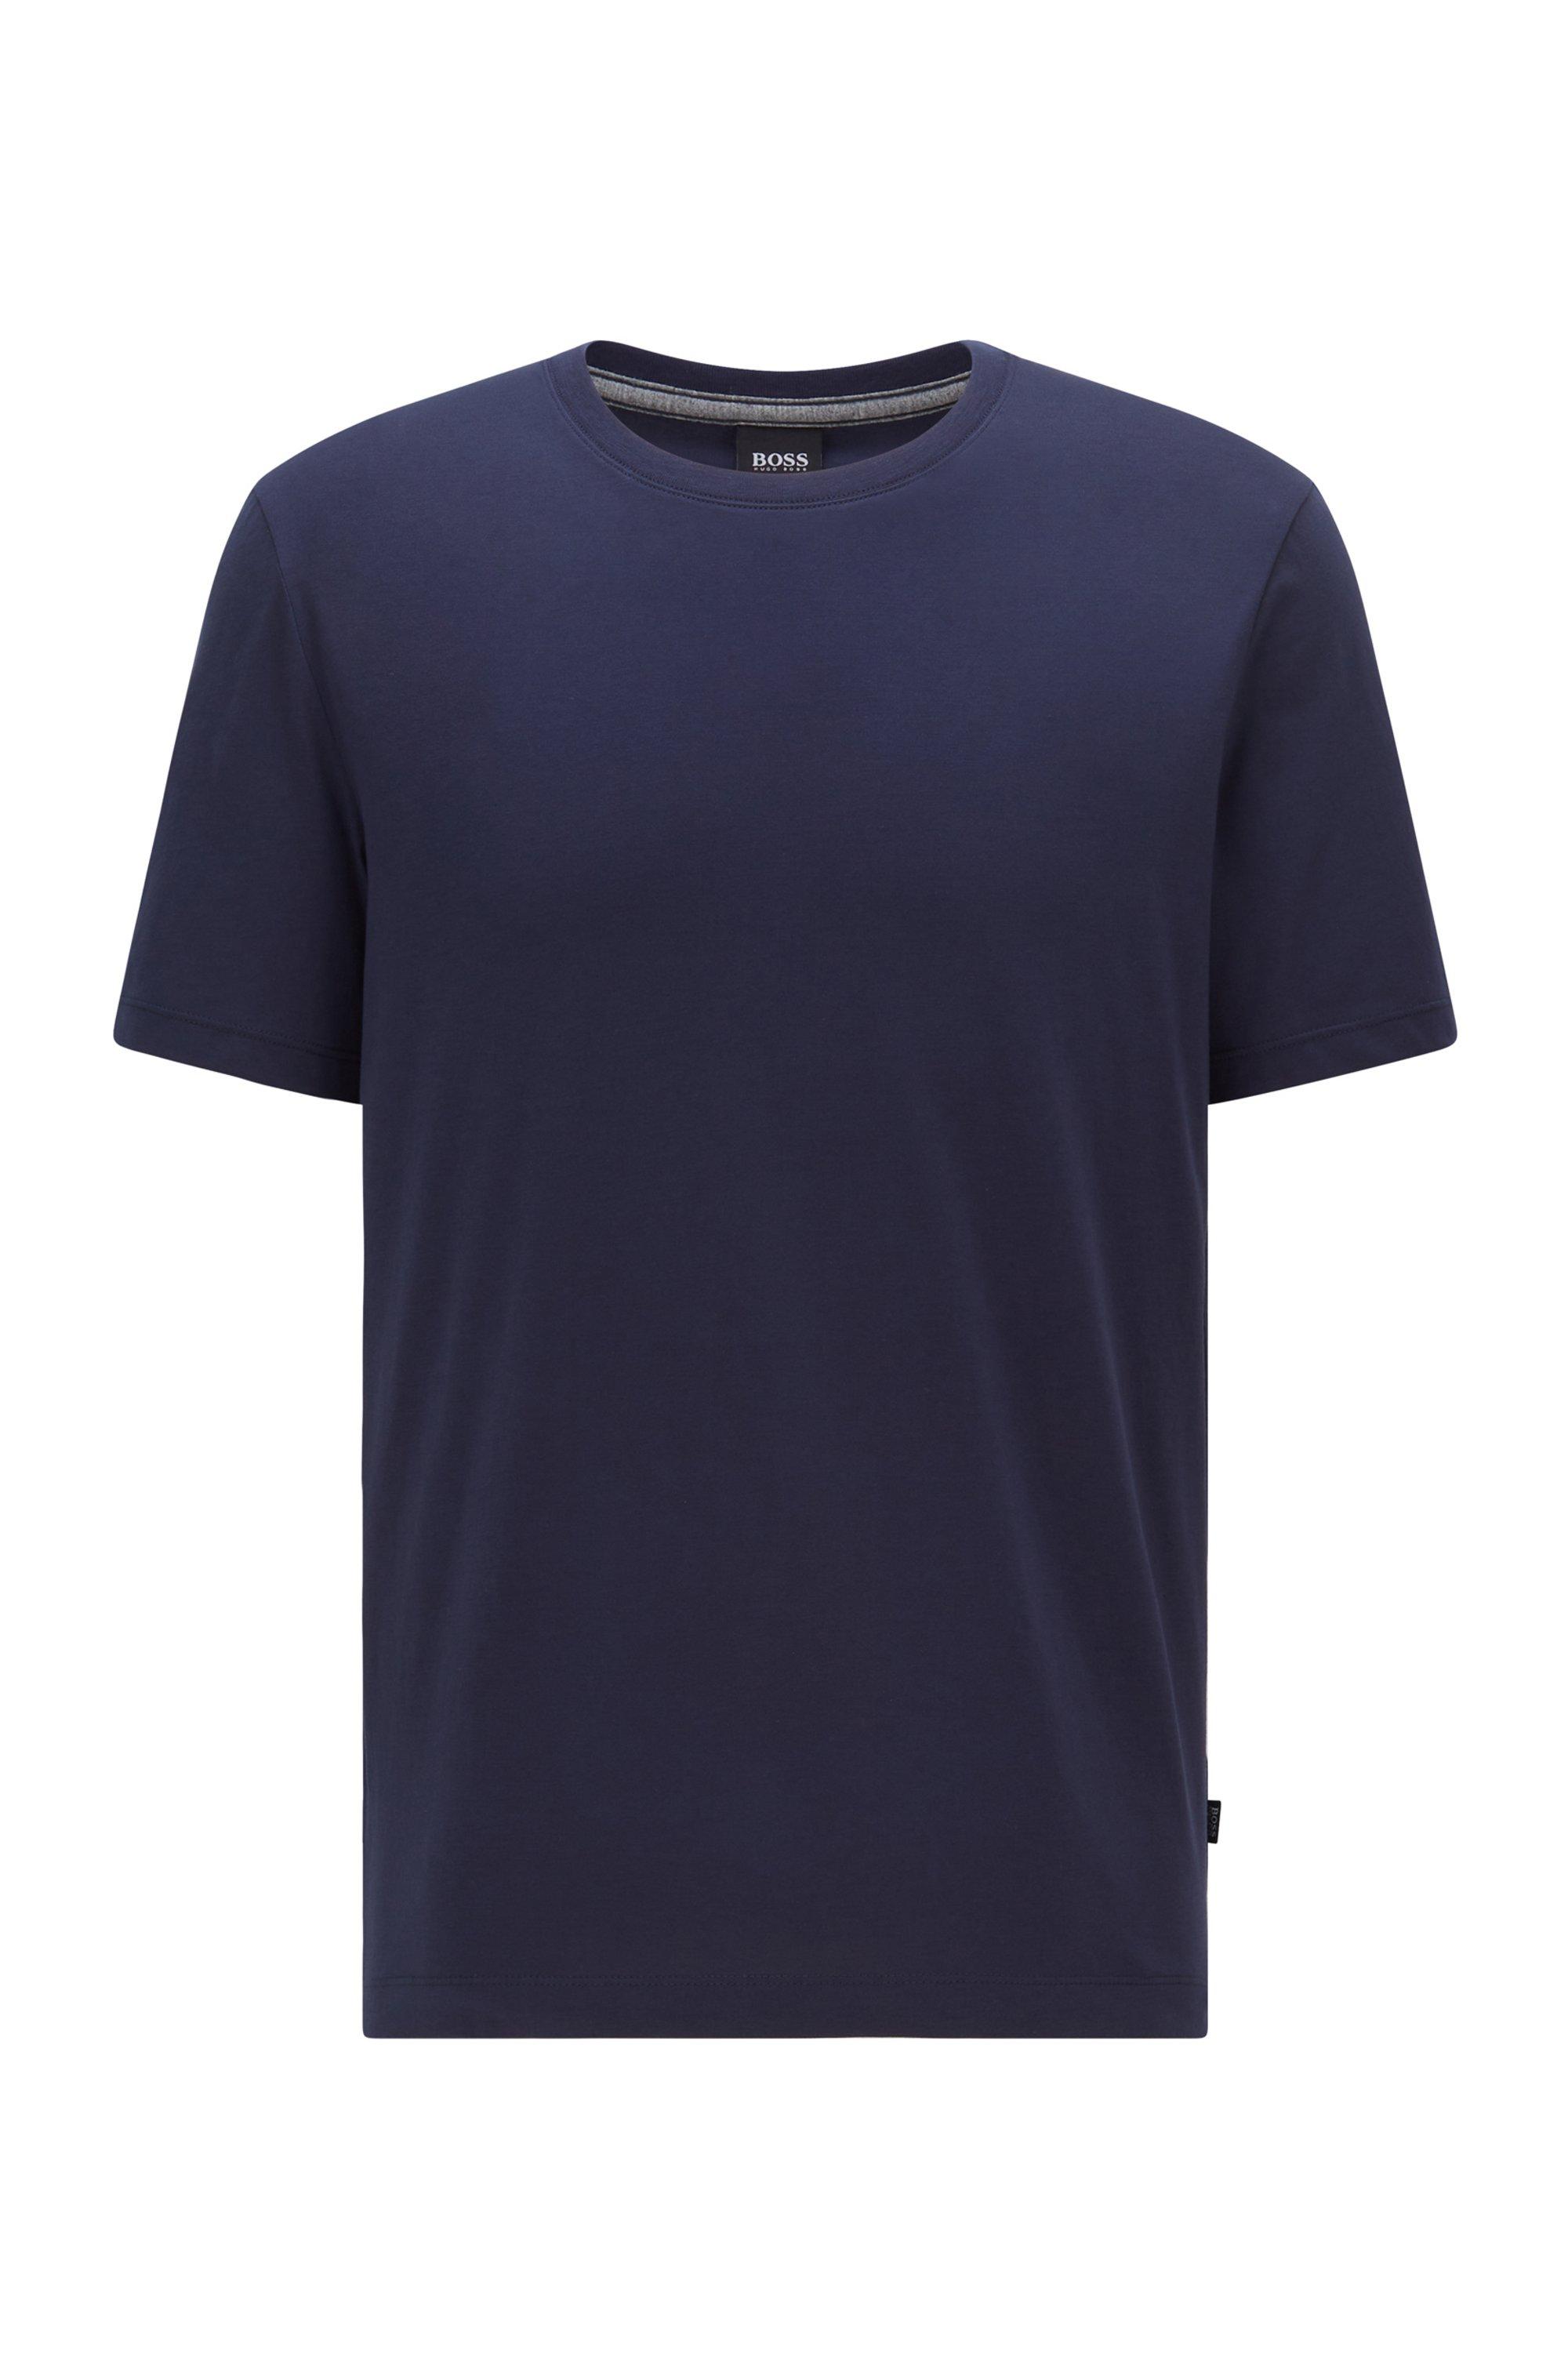 Crew-neck T-shirt in pure cotton with liquid finishing, Dark Blue